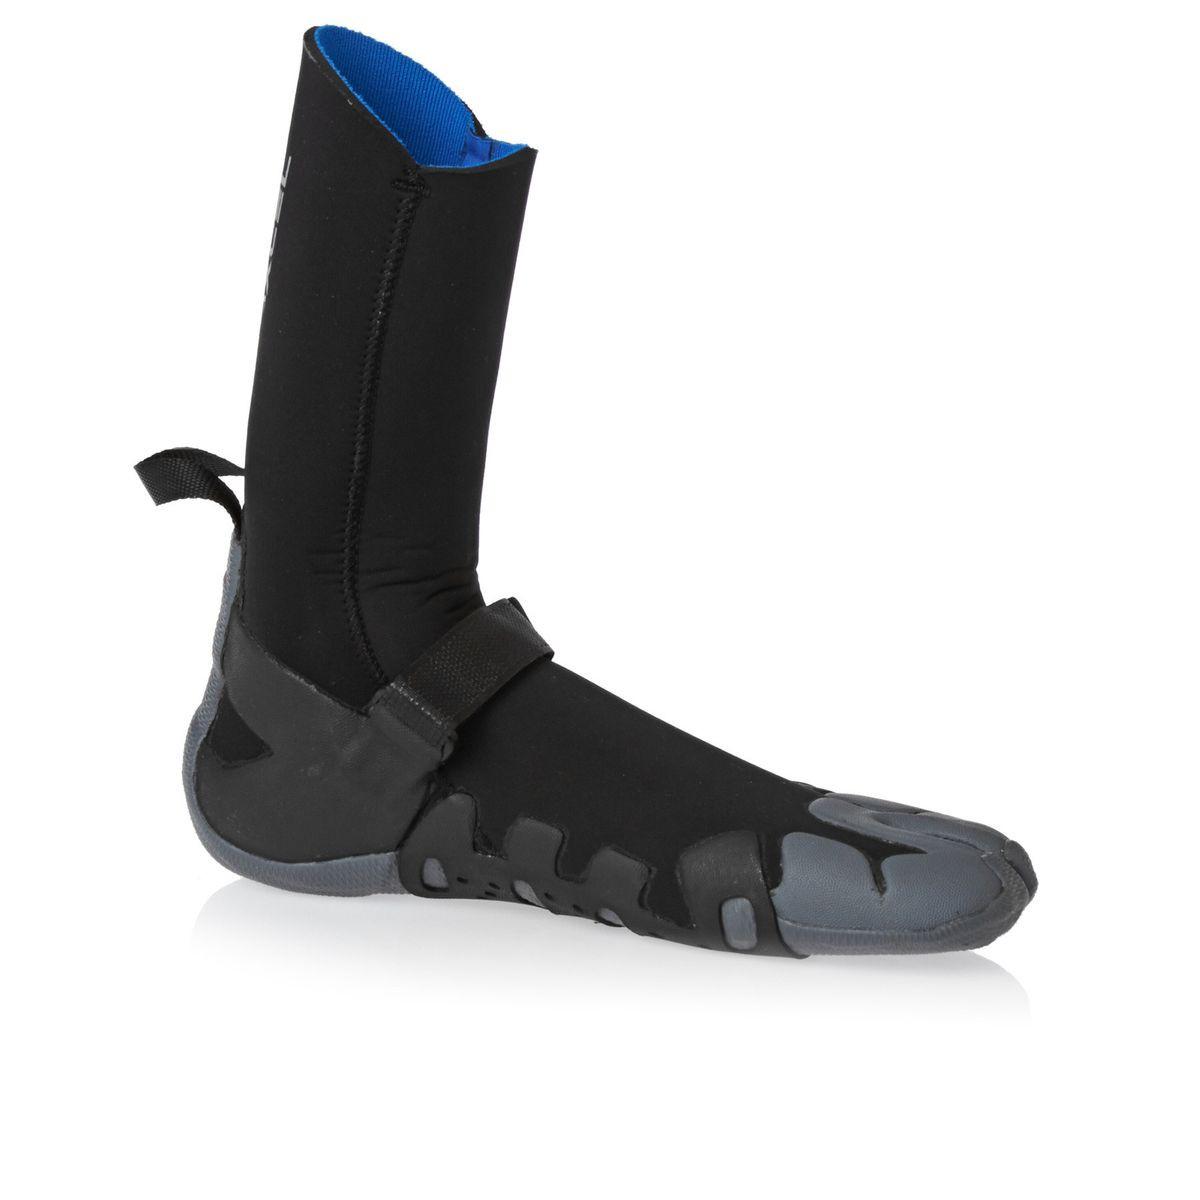 Xcel Infiniti 3mm Split Toe Wetsuit Boots - Black